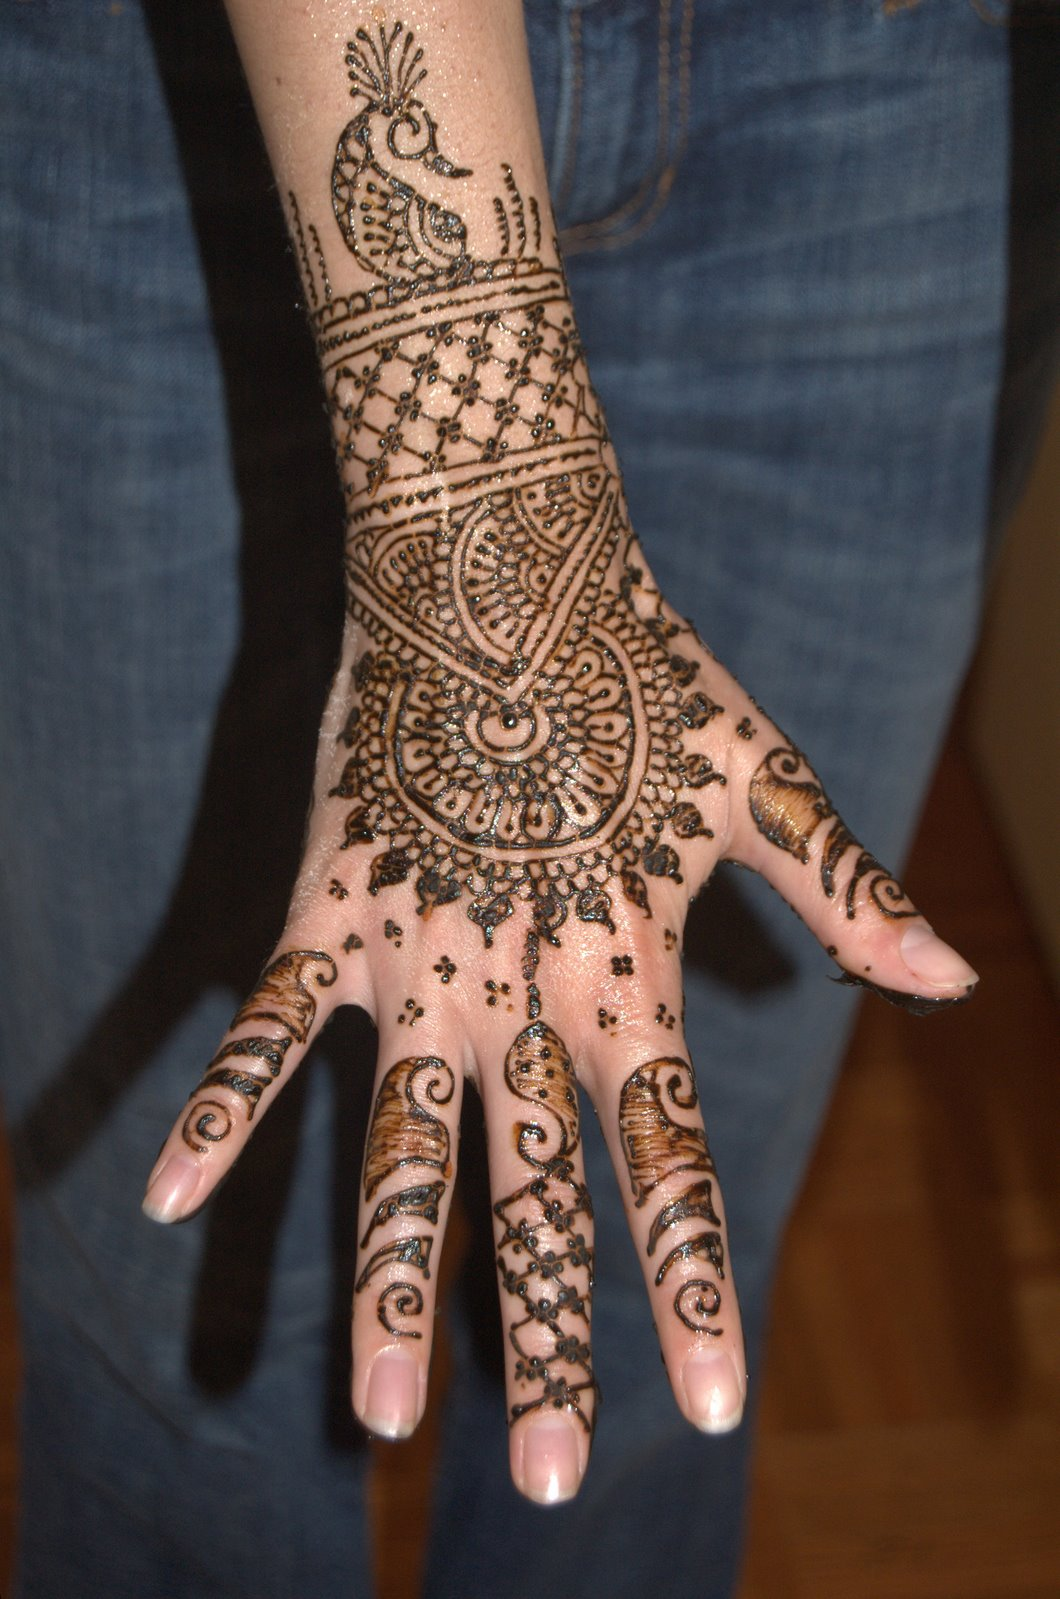 Mehndi Tattoo Hands : Hand mehndi designs celebrity tattoos female